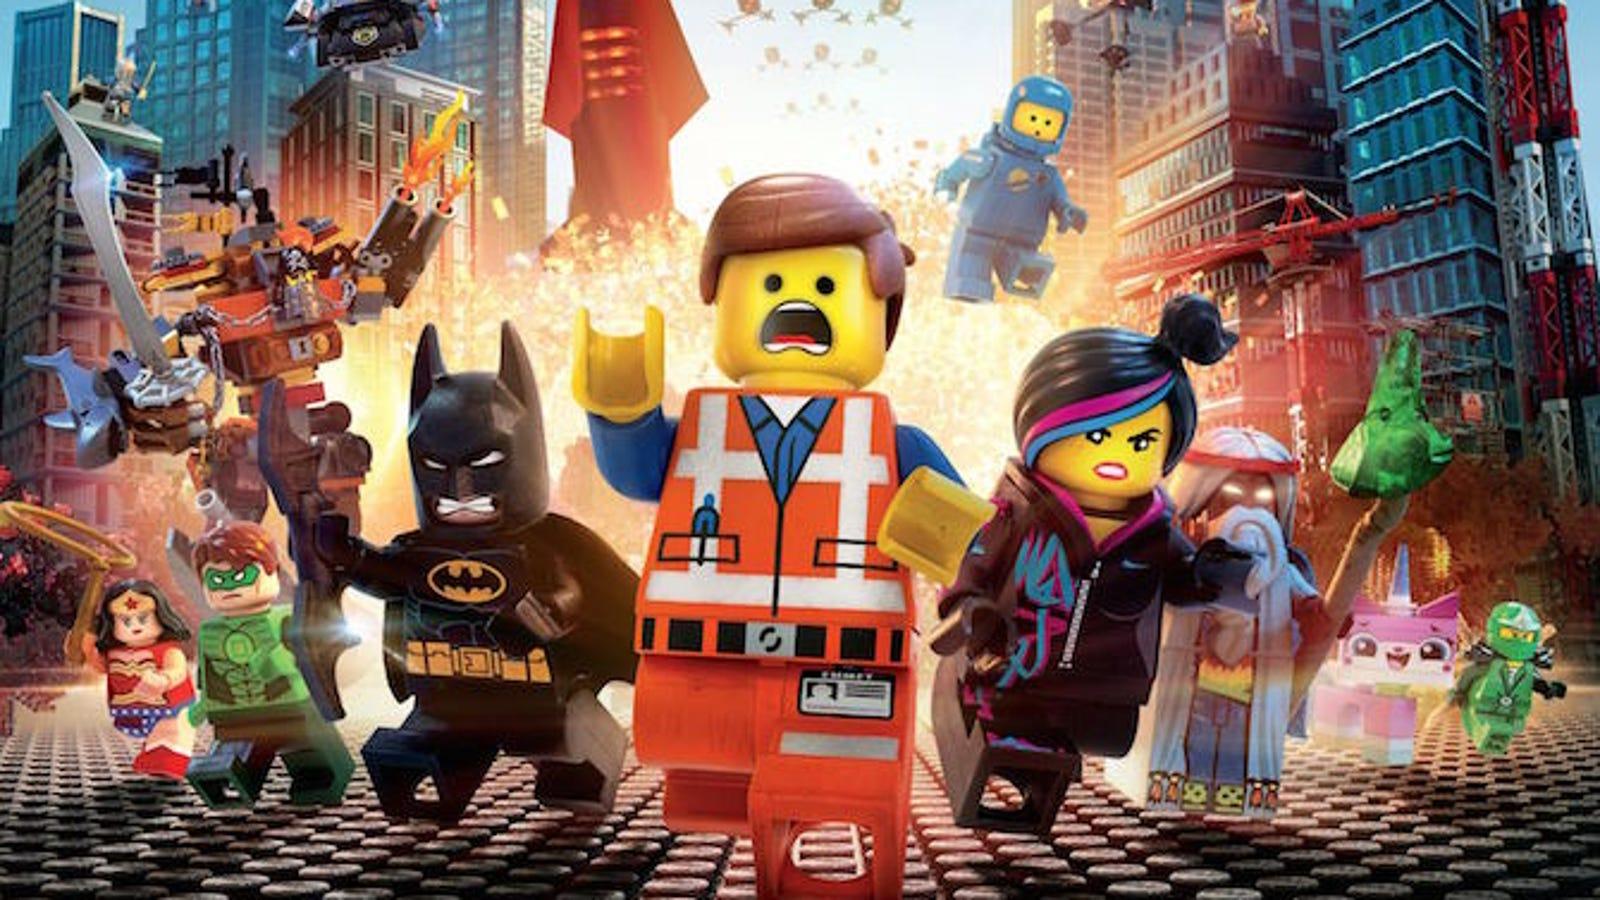 15 detalles curiosos que tal vez desconocías de la película de Lego